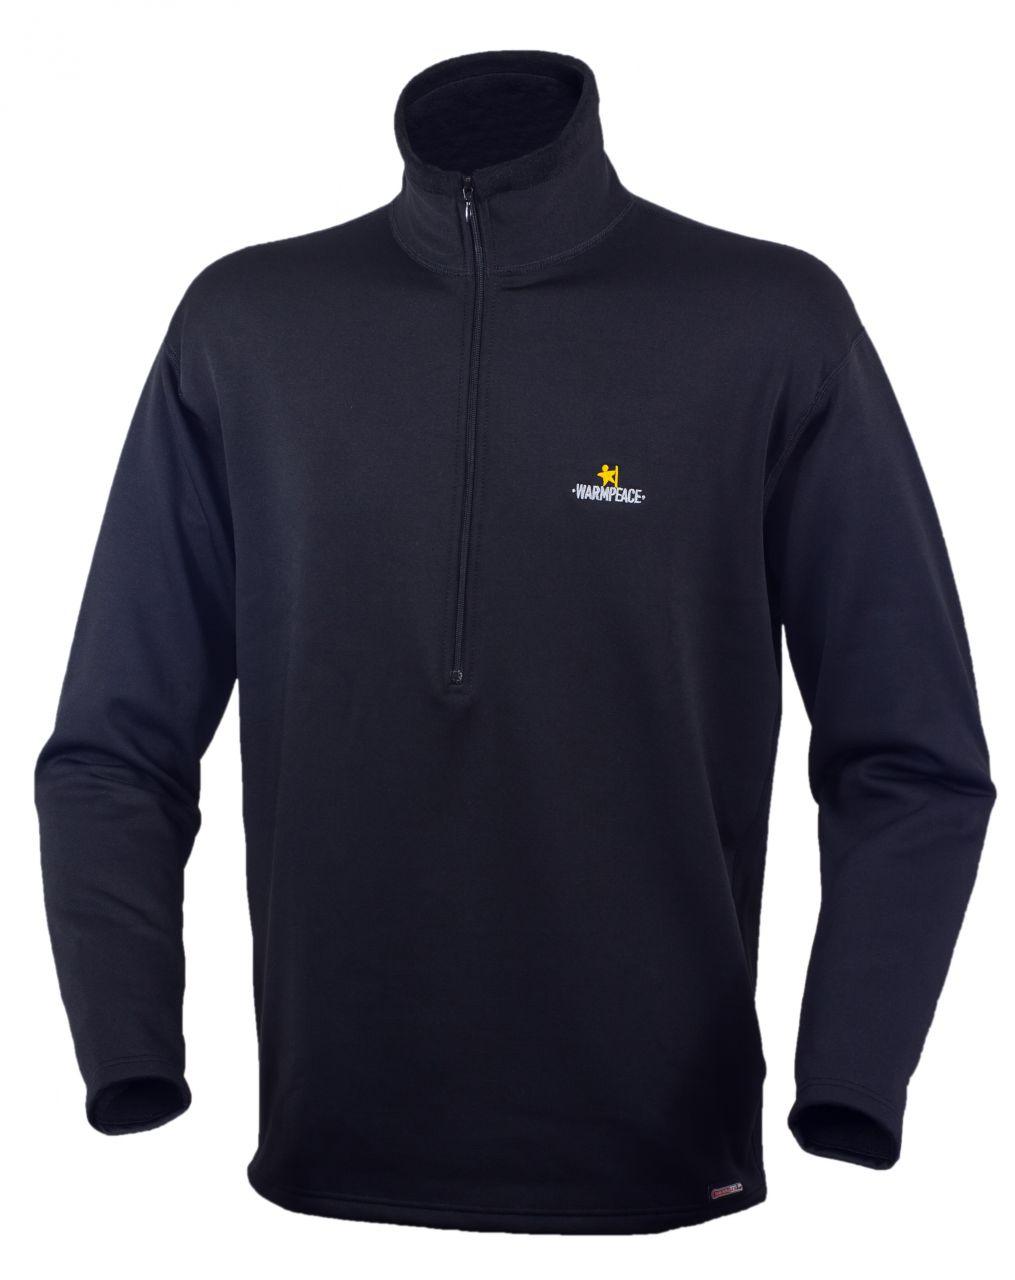 Warmpeace Pulover Fram Powerstretch black L